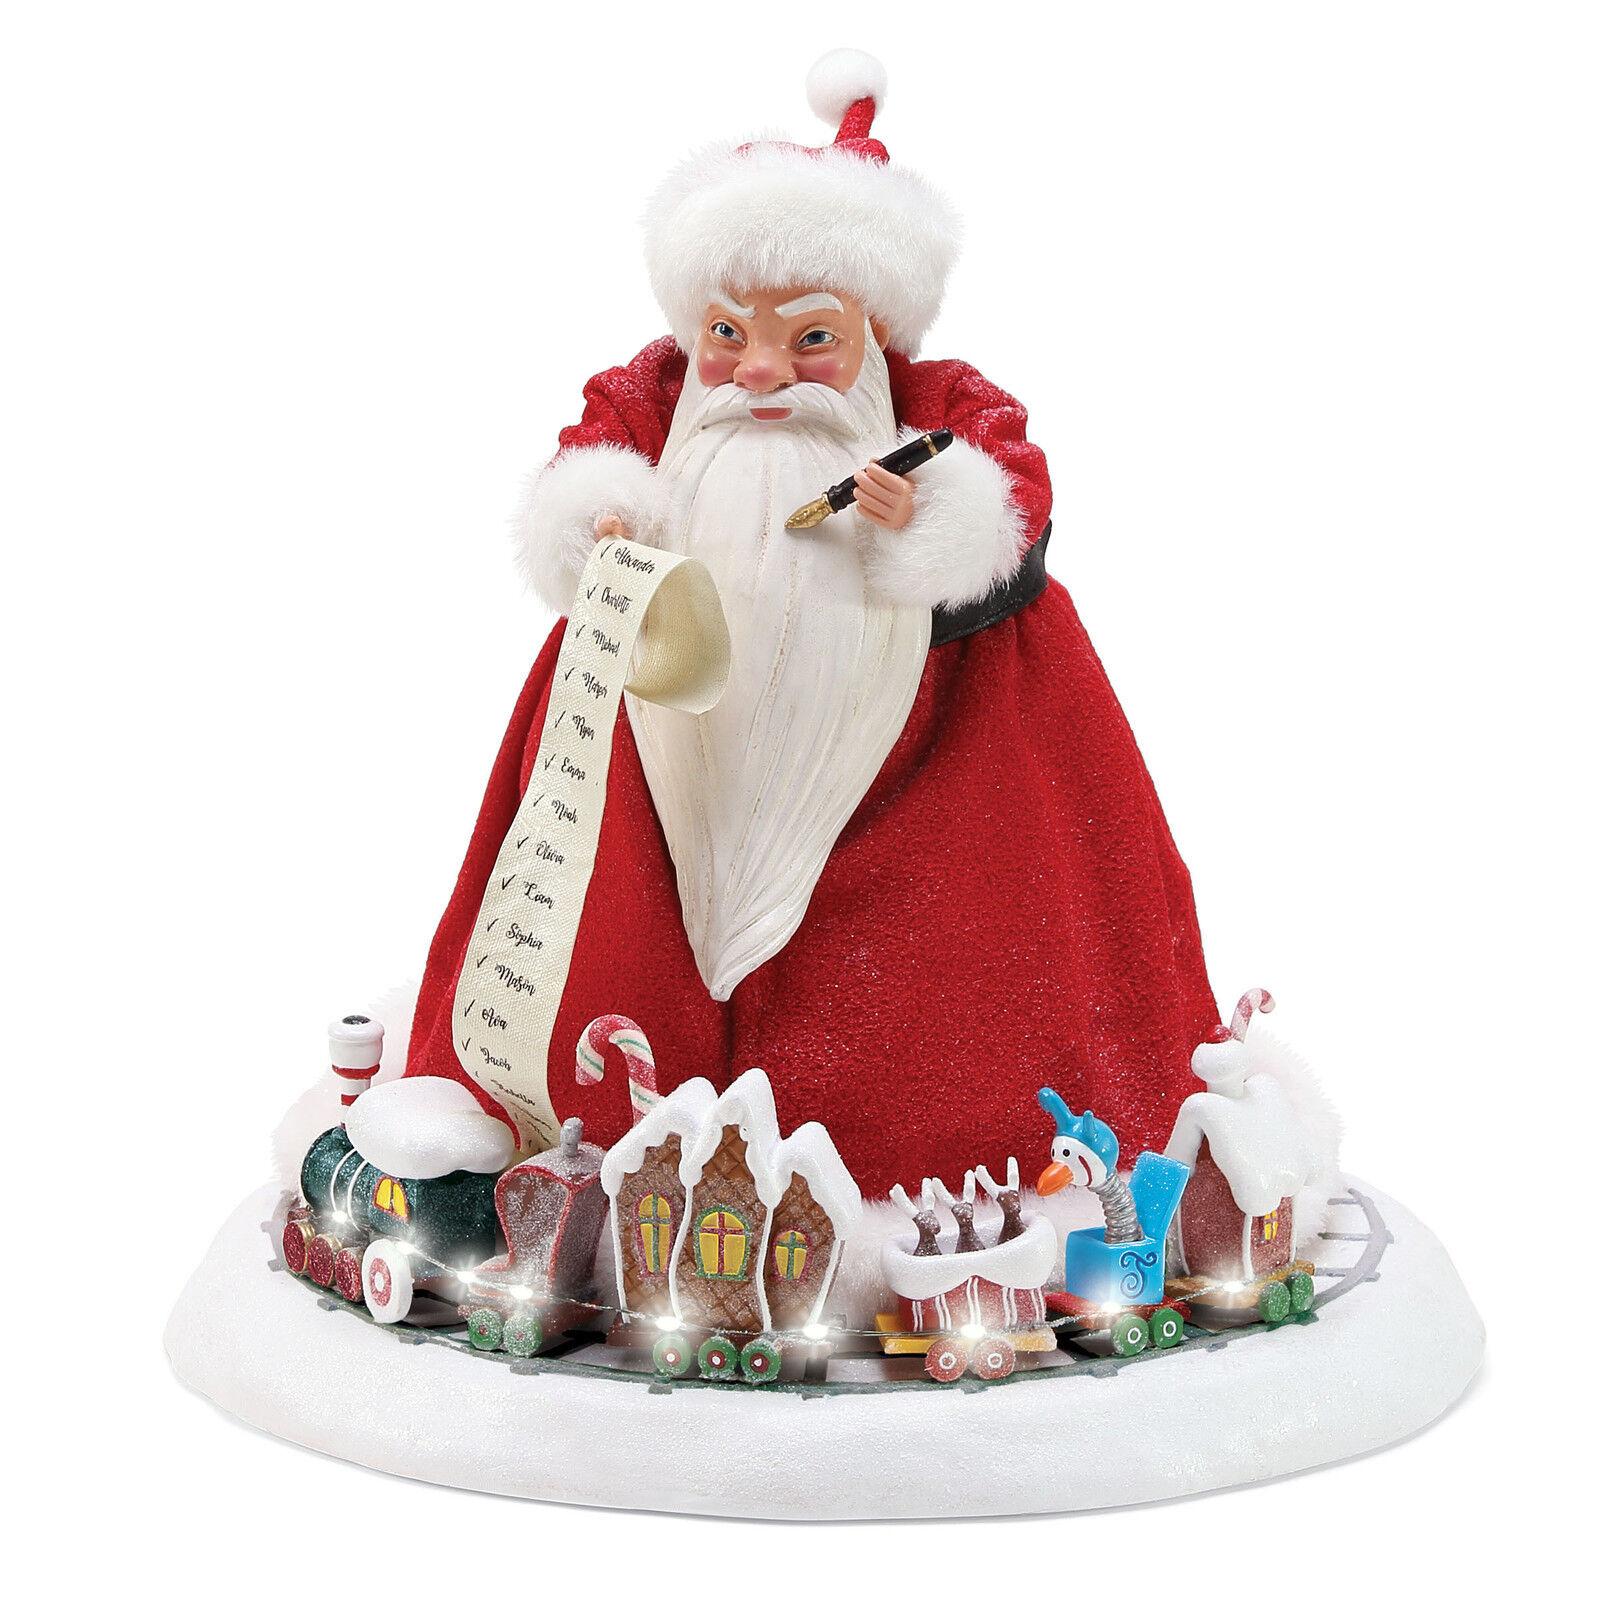 Possible Dreams Clothtique 2018 Snow White/'s Christmas Celebration #6003369 NIB